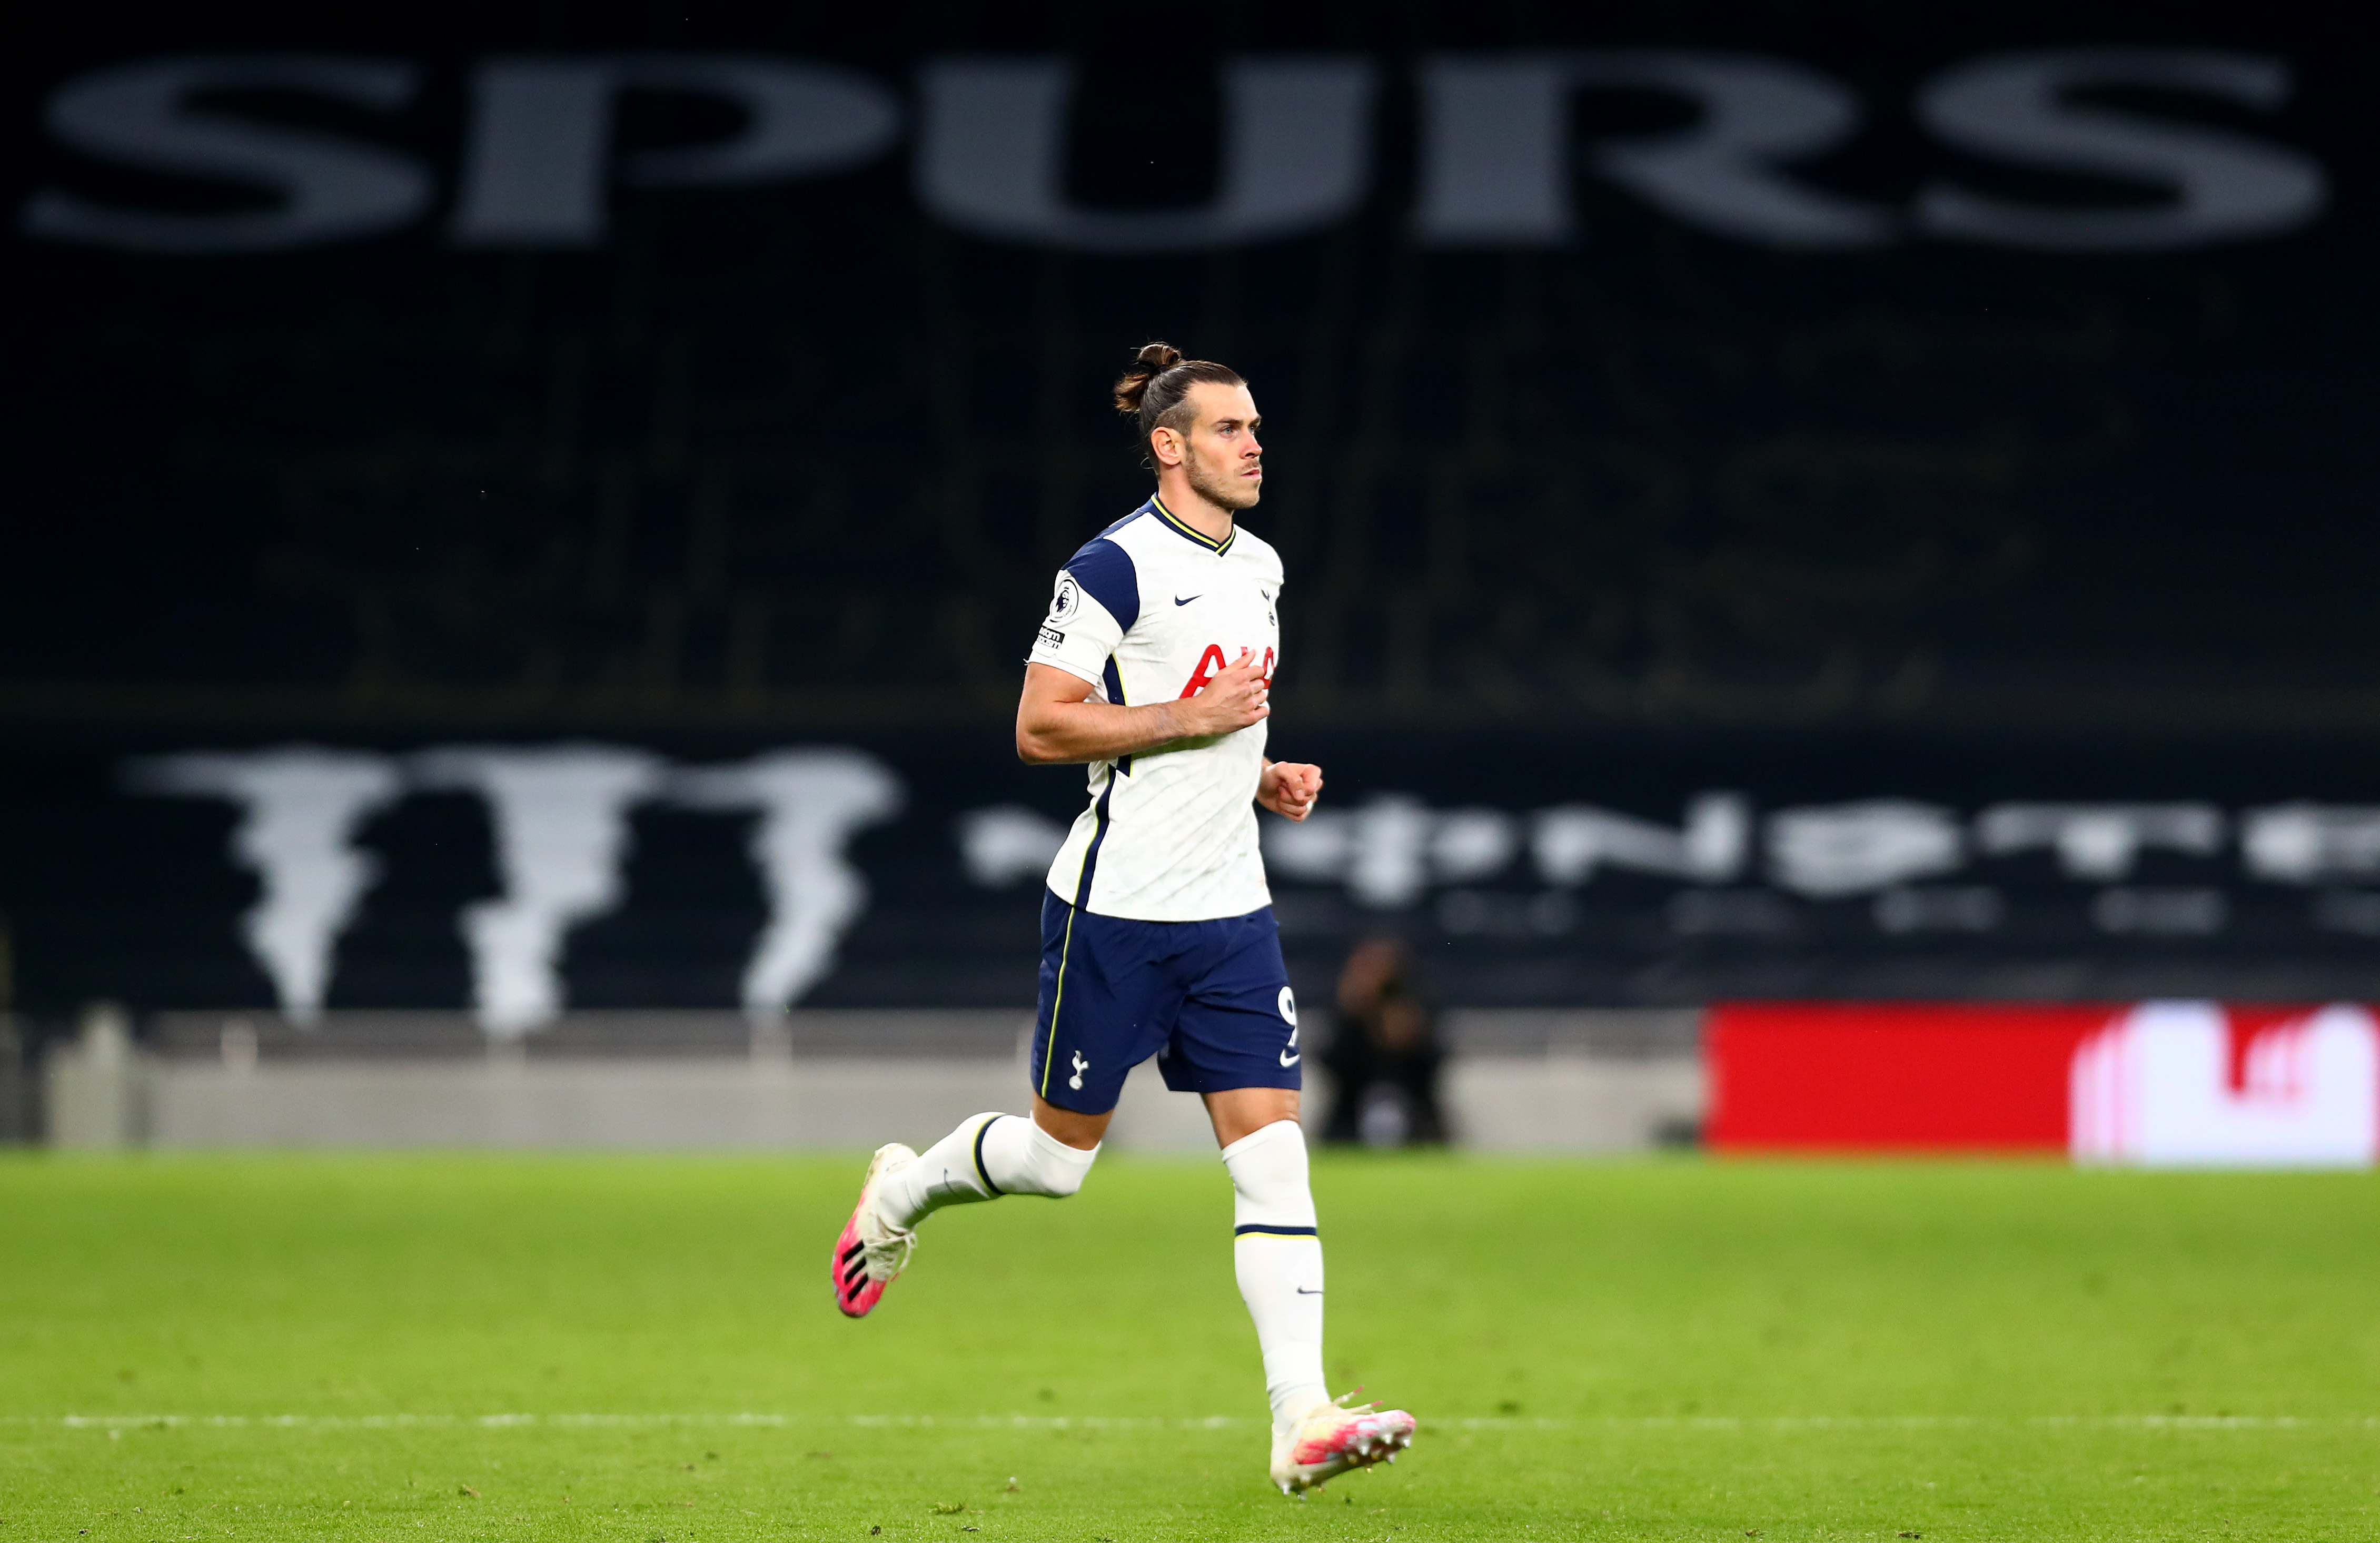 Bale's Agent: We need to ask Zidane if Real Madrid needs Gareth